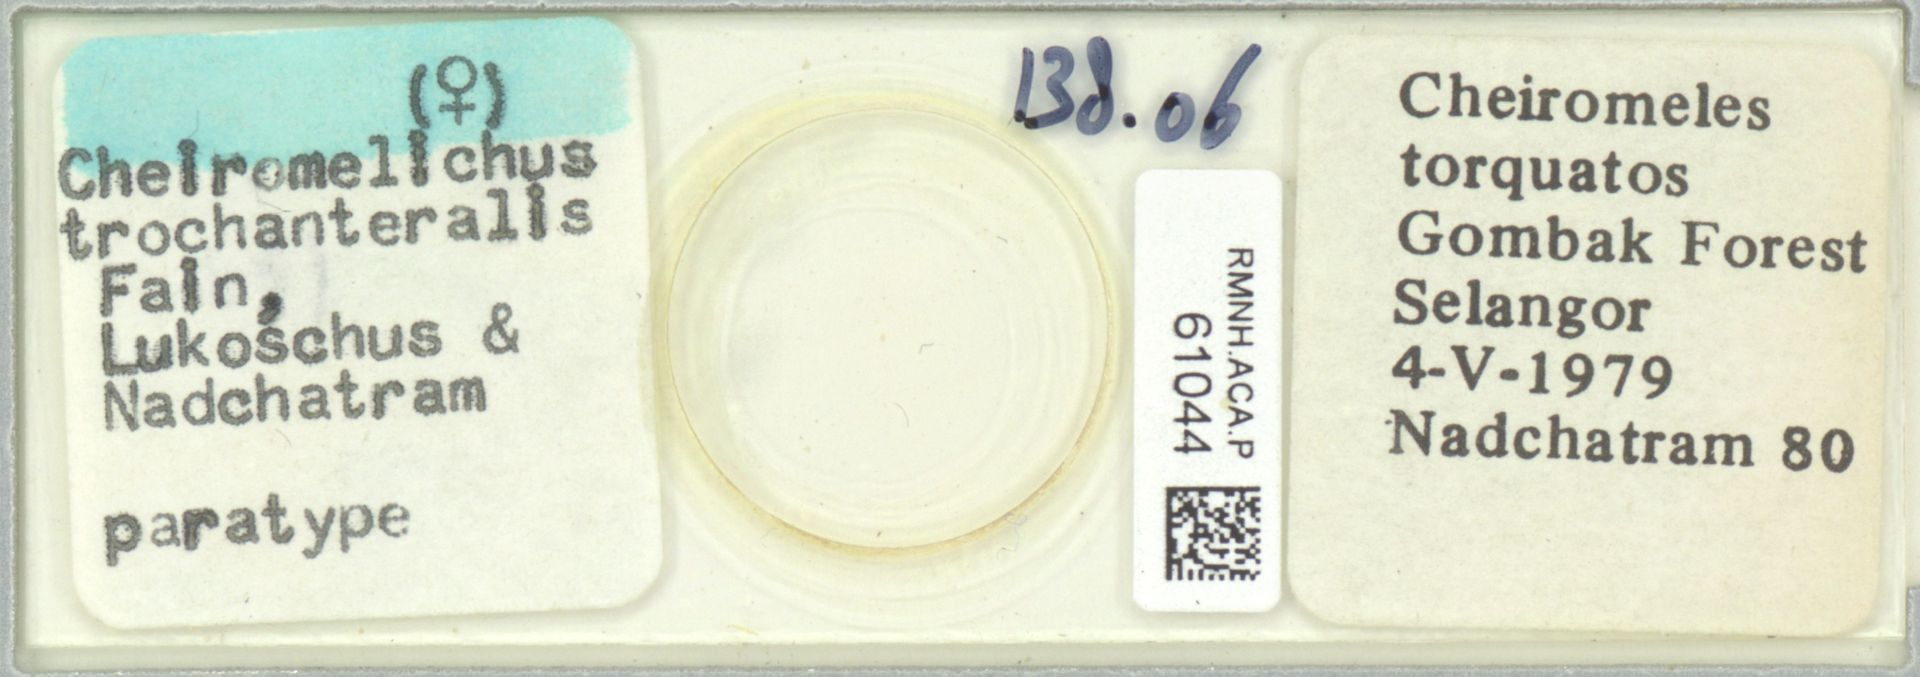 RMNH.ACA.P.61044 | Cheiromelichus trochanteralis Fain, Lukoschus & Nadchatram